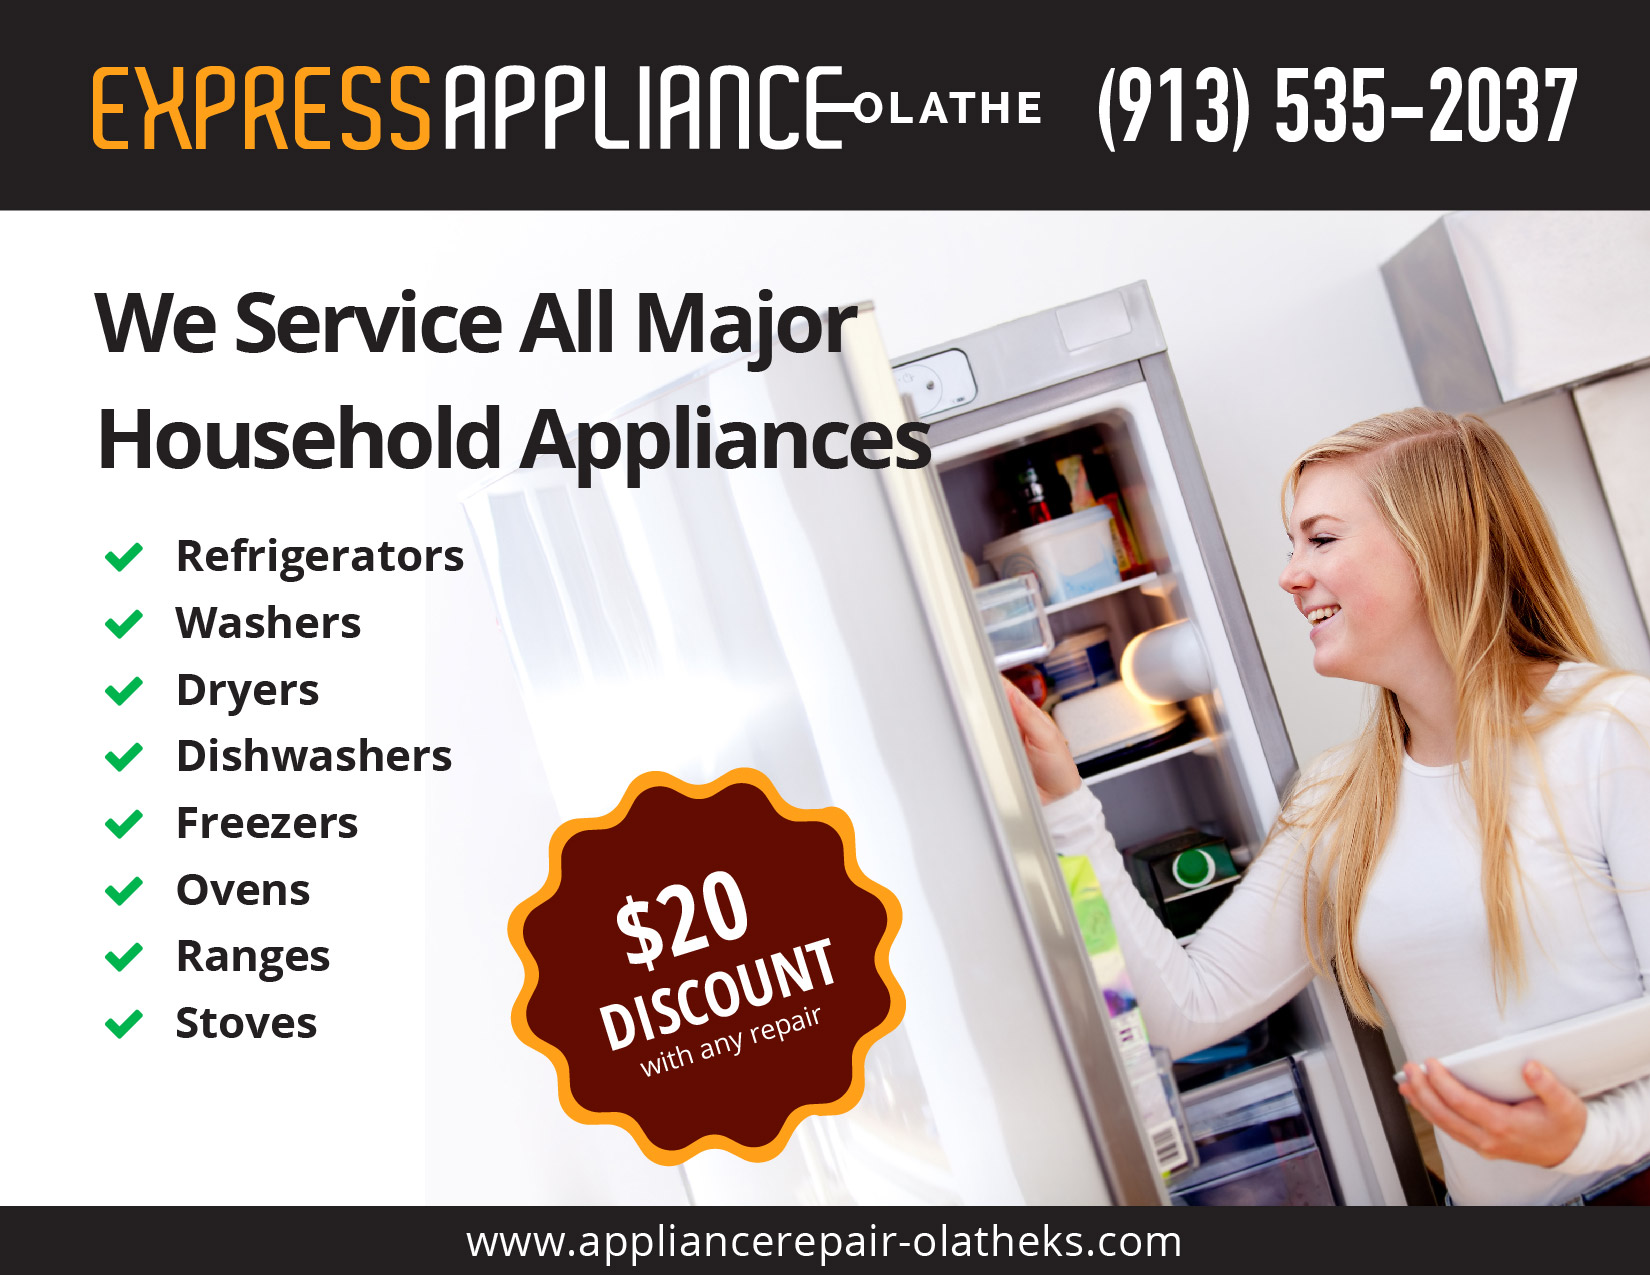 Ge Appliance Repair Kansas City Express Appliance Repair Of Olathe 913 535 2037